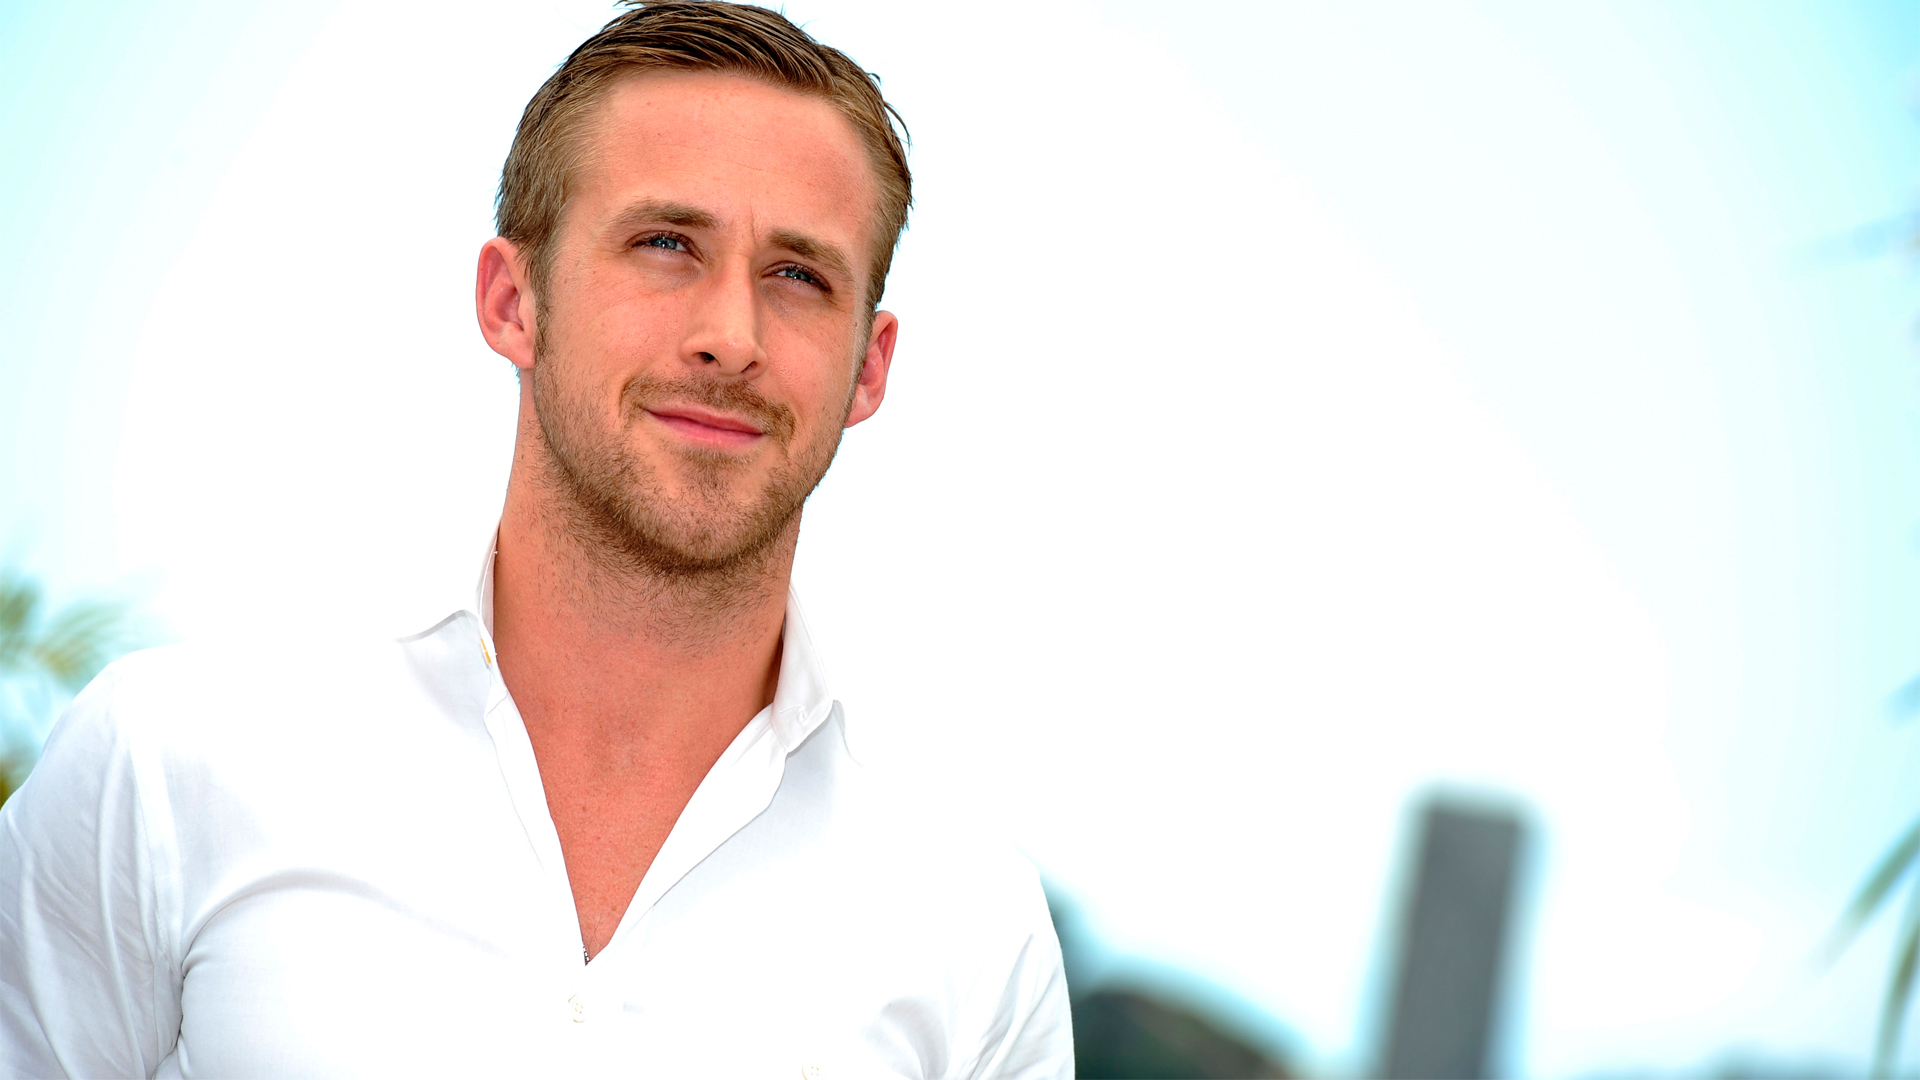 HD Ryan Gosling Wallpapers HdCoolWallpapersCom 1920x1080